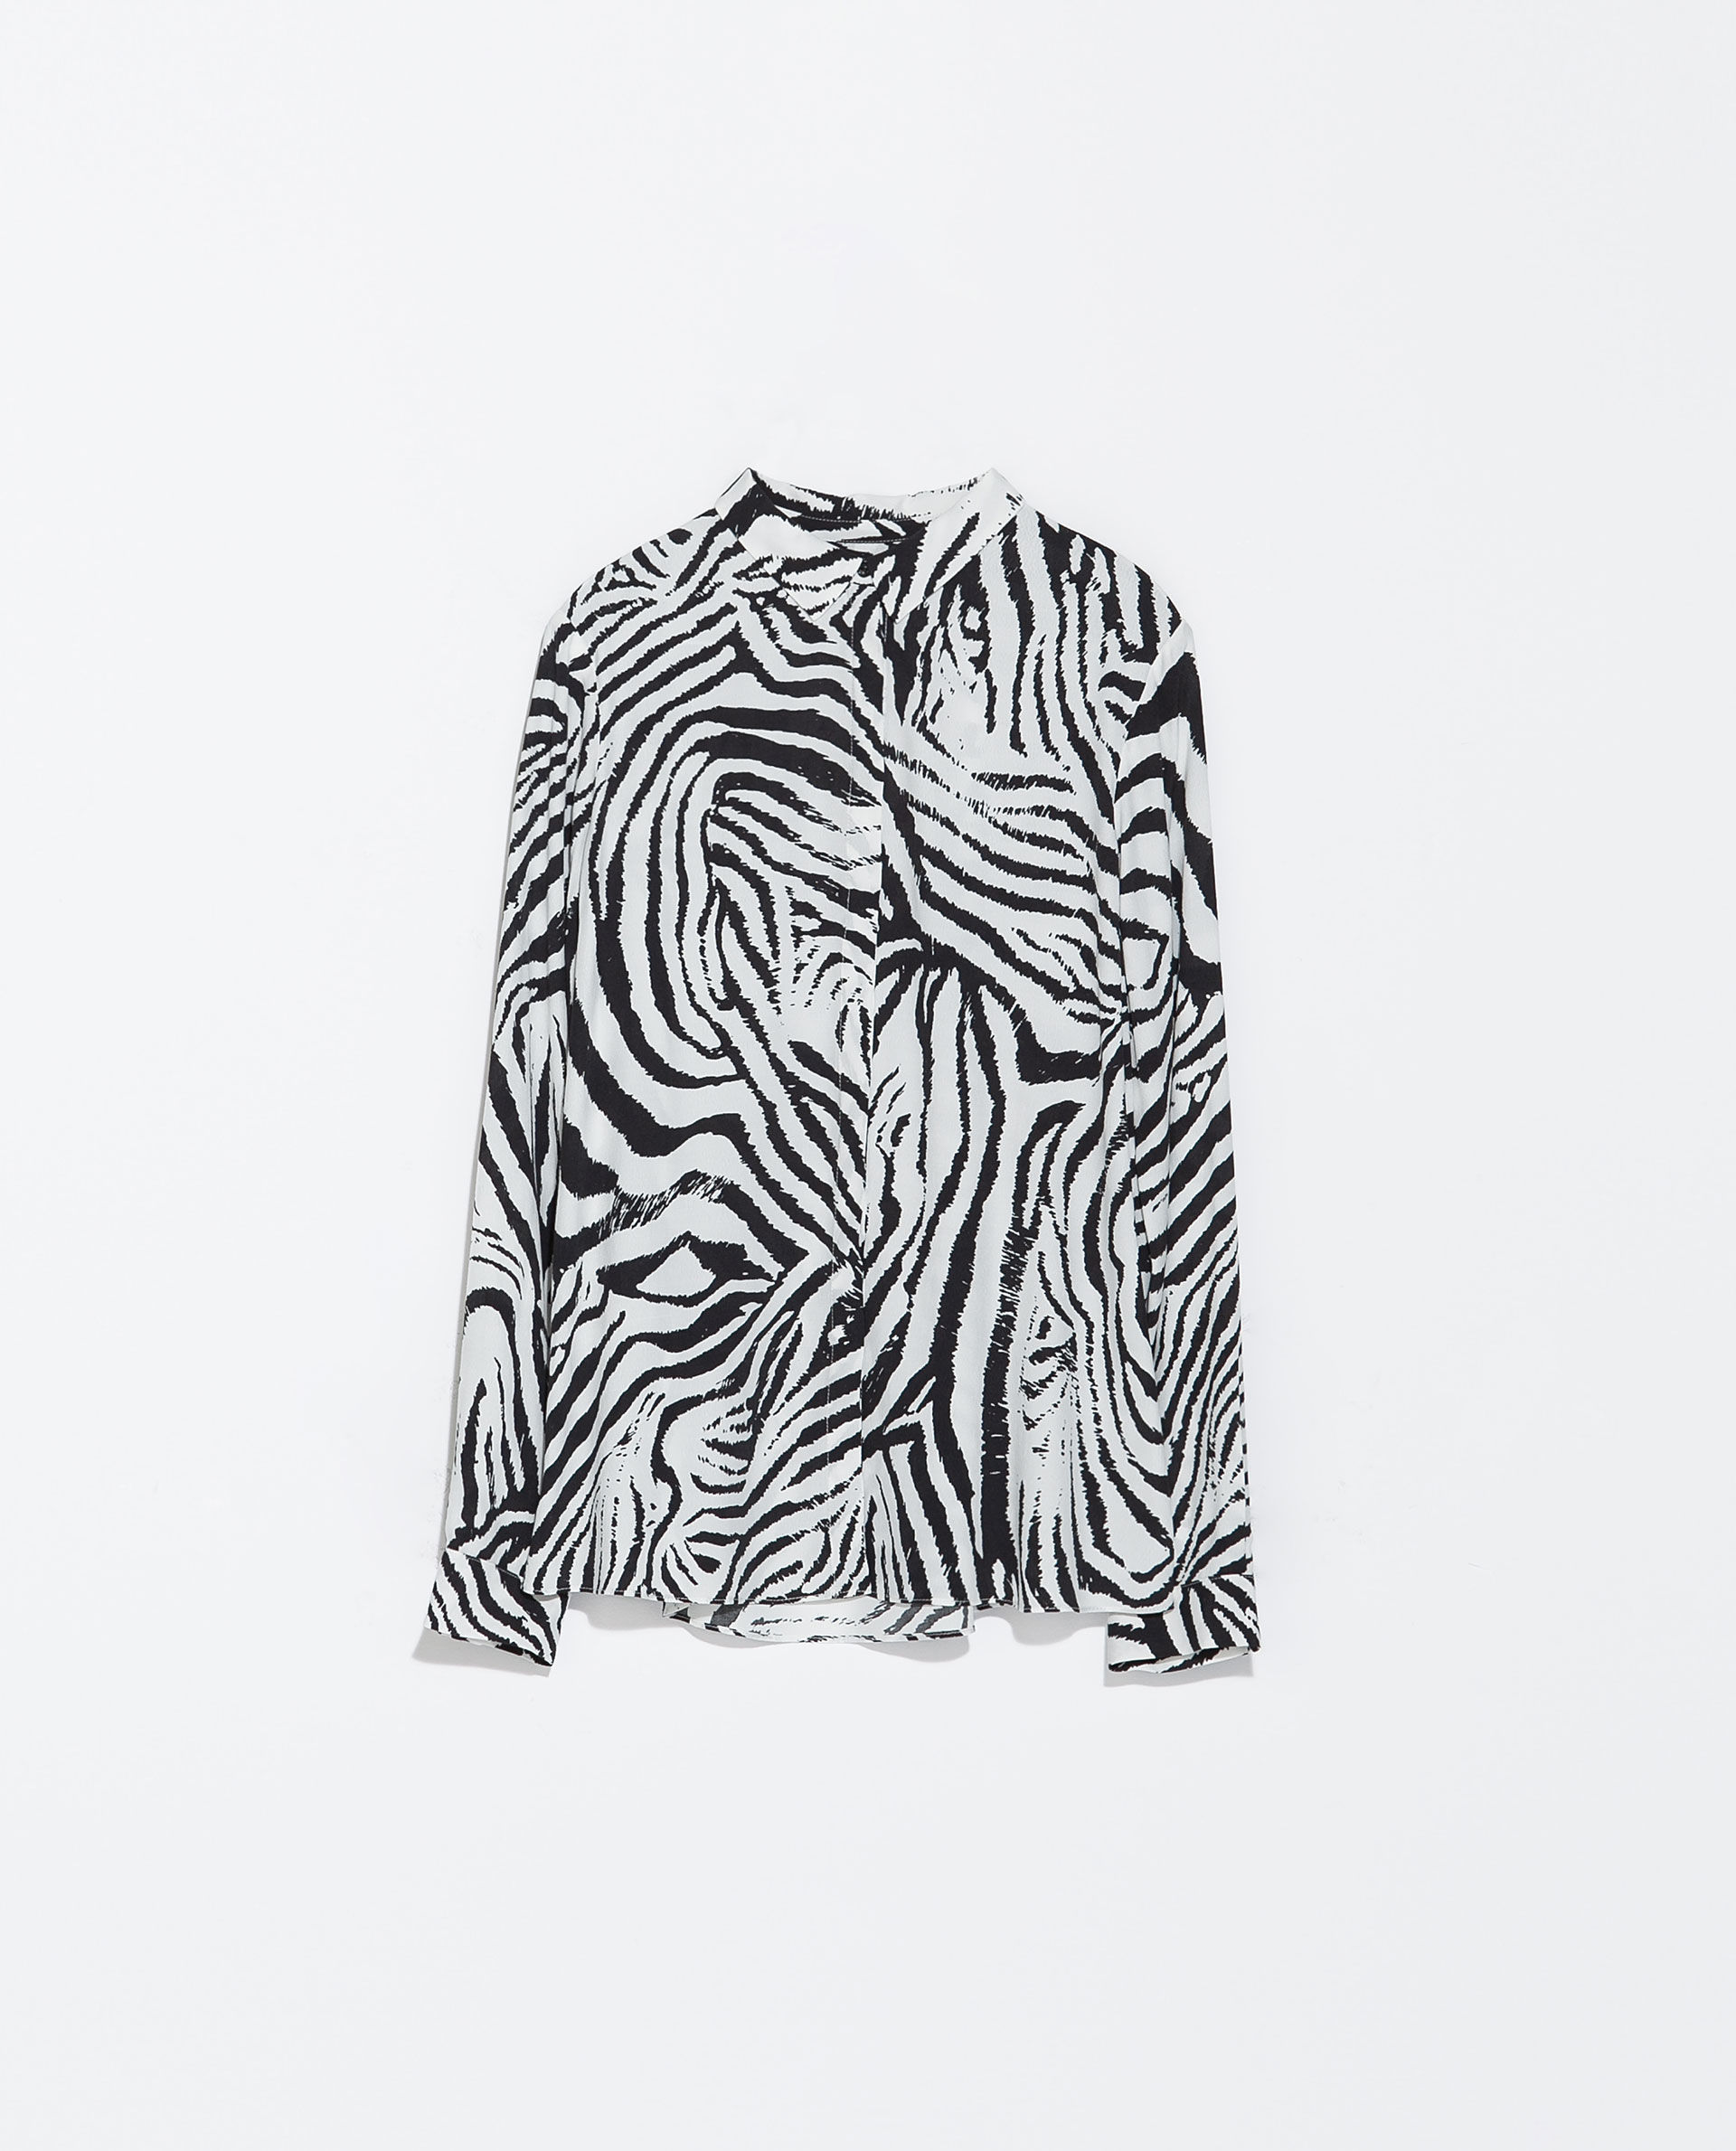 Zara Zebra Print Blouse 15